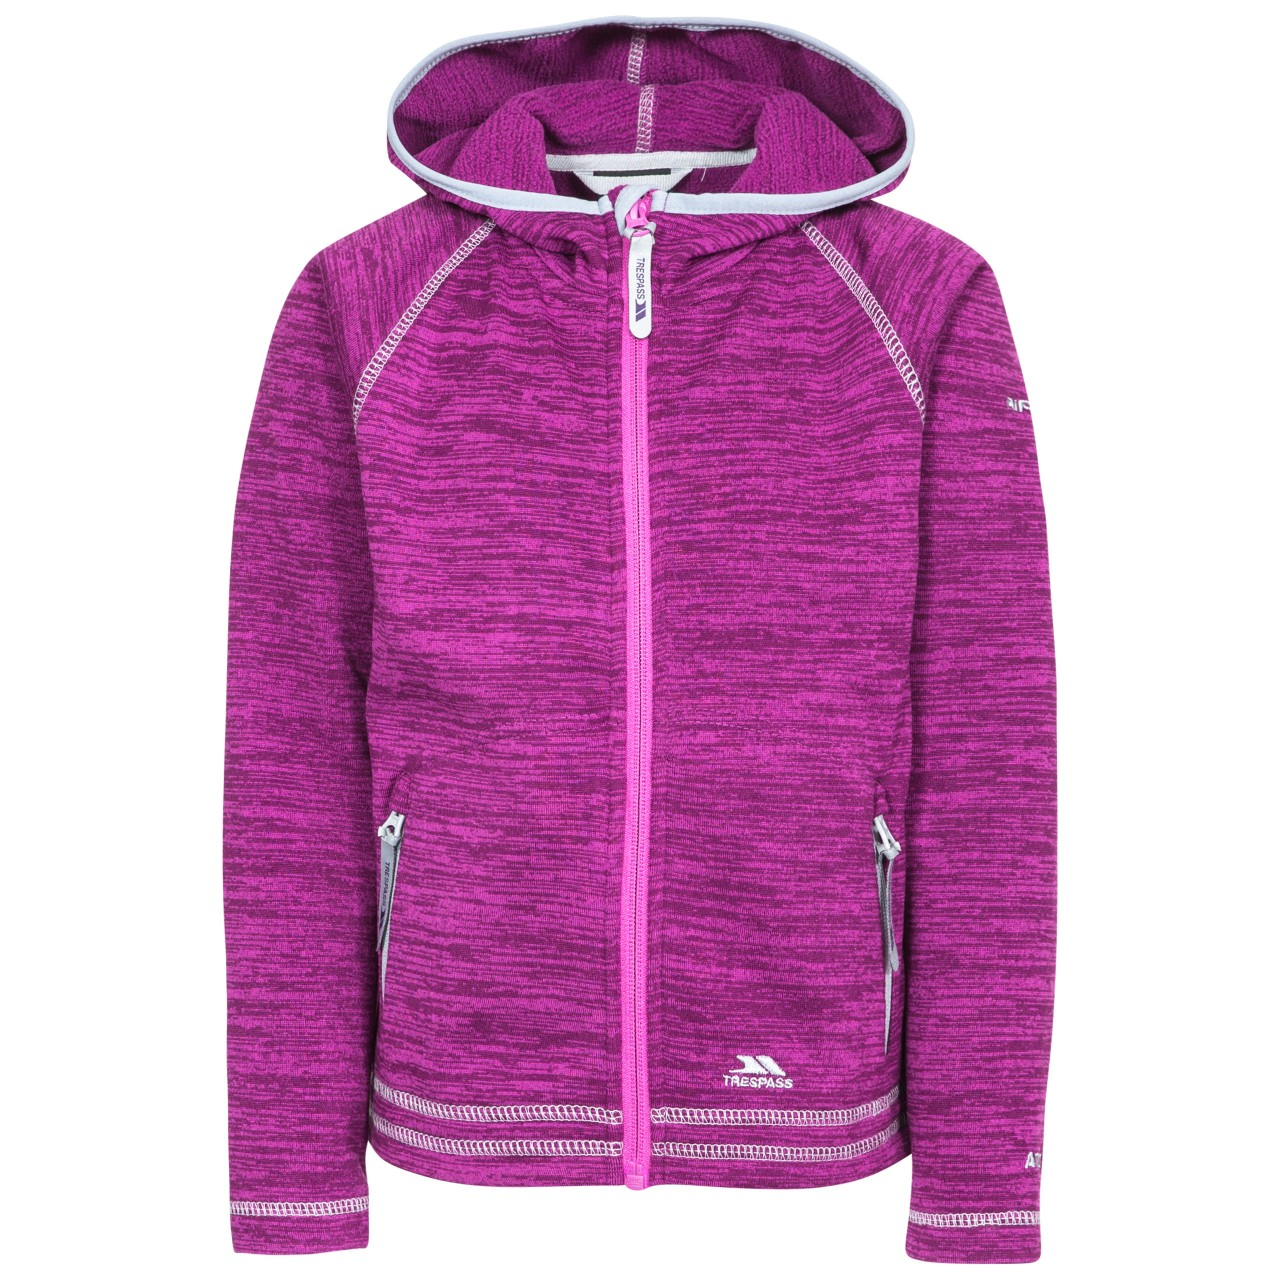 Trespass Childrens Girls Goodness Full Zip Hooded Fleece Jacket (3-4 Years) (Purple Orchid Marl)